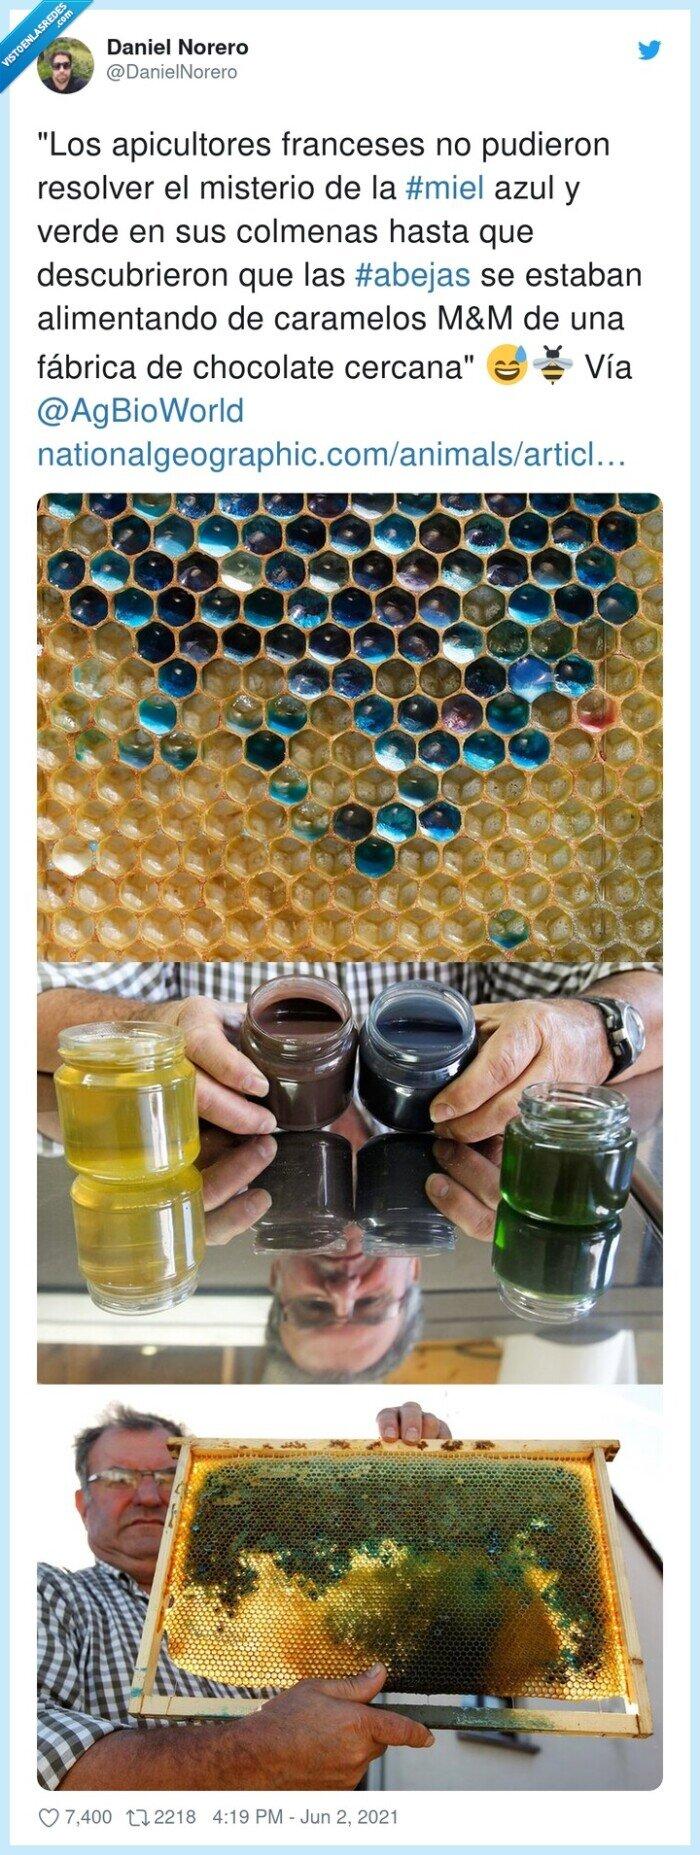 abejas,alimentarse,apicultores,caramelos,chocolate,colmena,miel